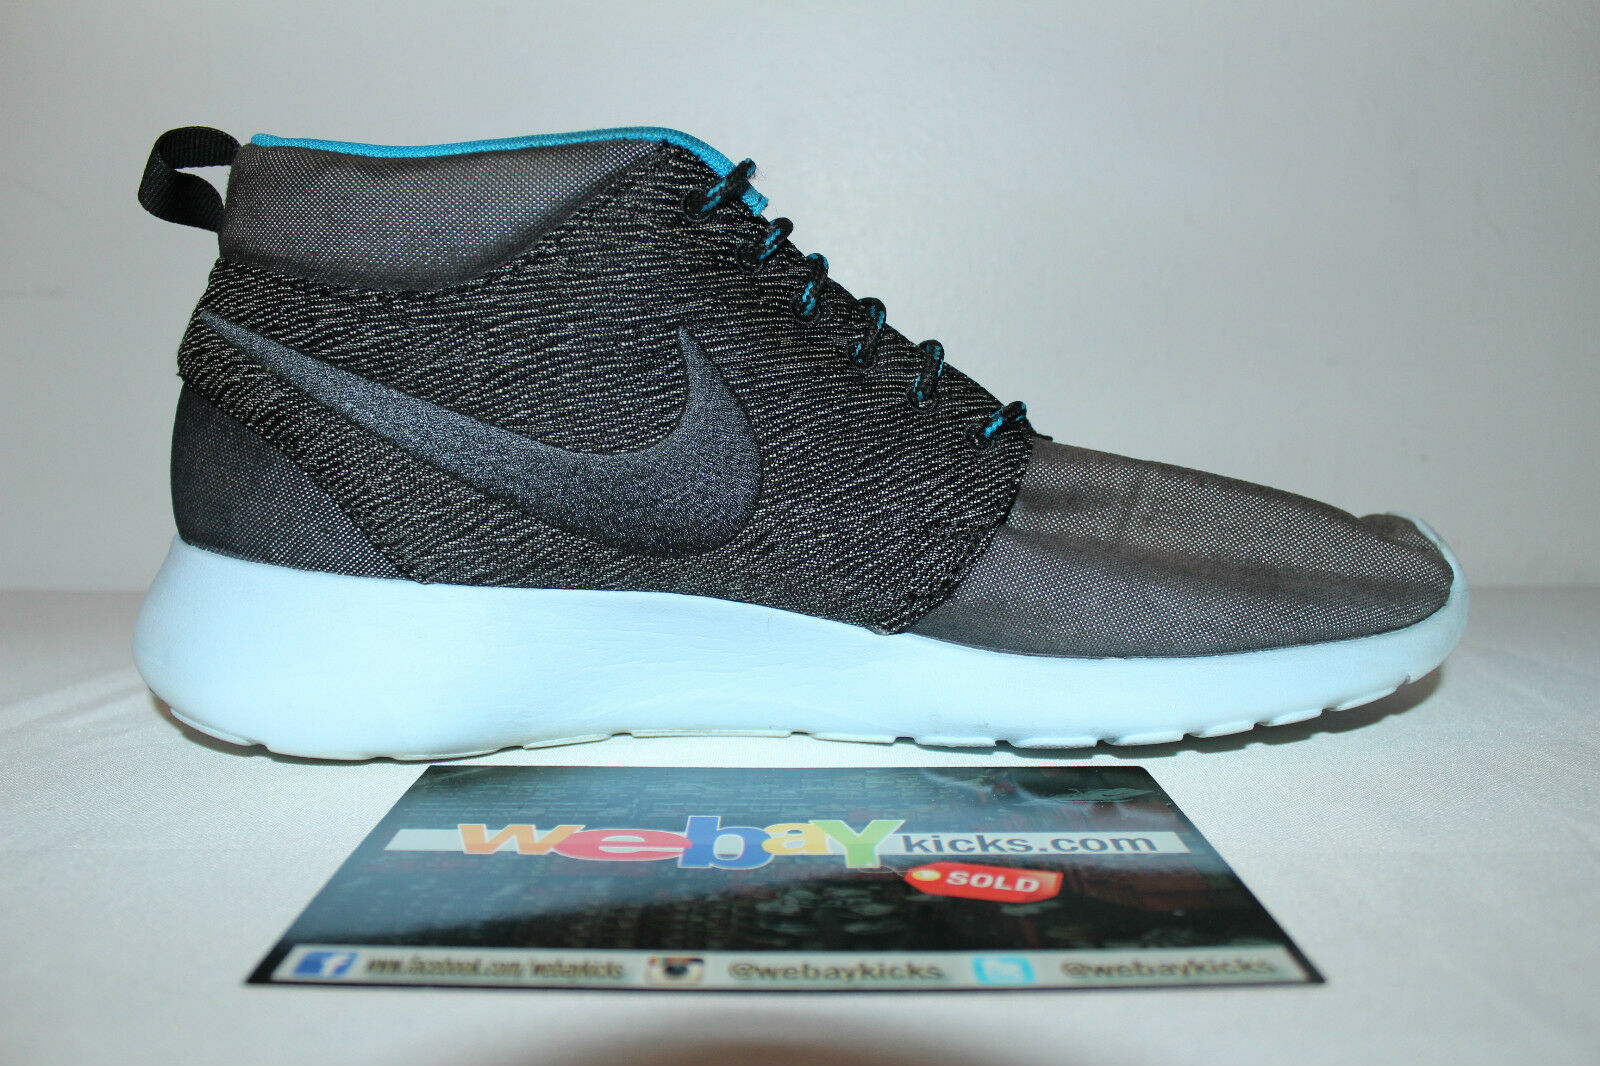 buy popular 8cdd2 e50af ... Nike Air Roshe Run Mid Paris Blue Gray Gray Gray Grey Sneakers Men s  Size 12 Used ...